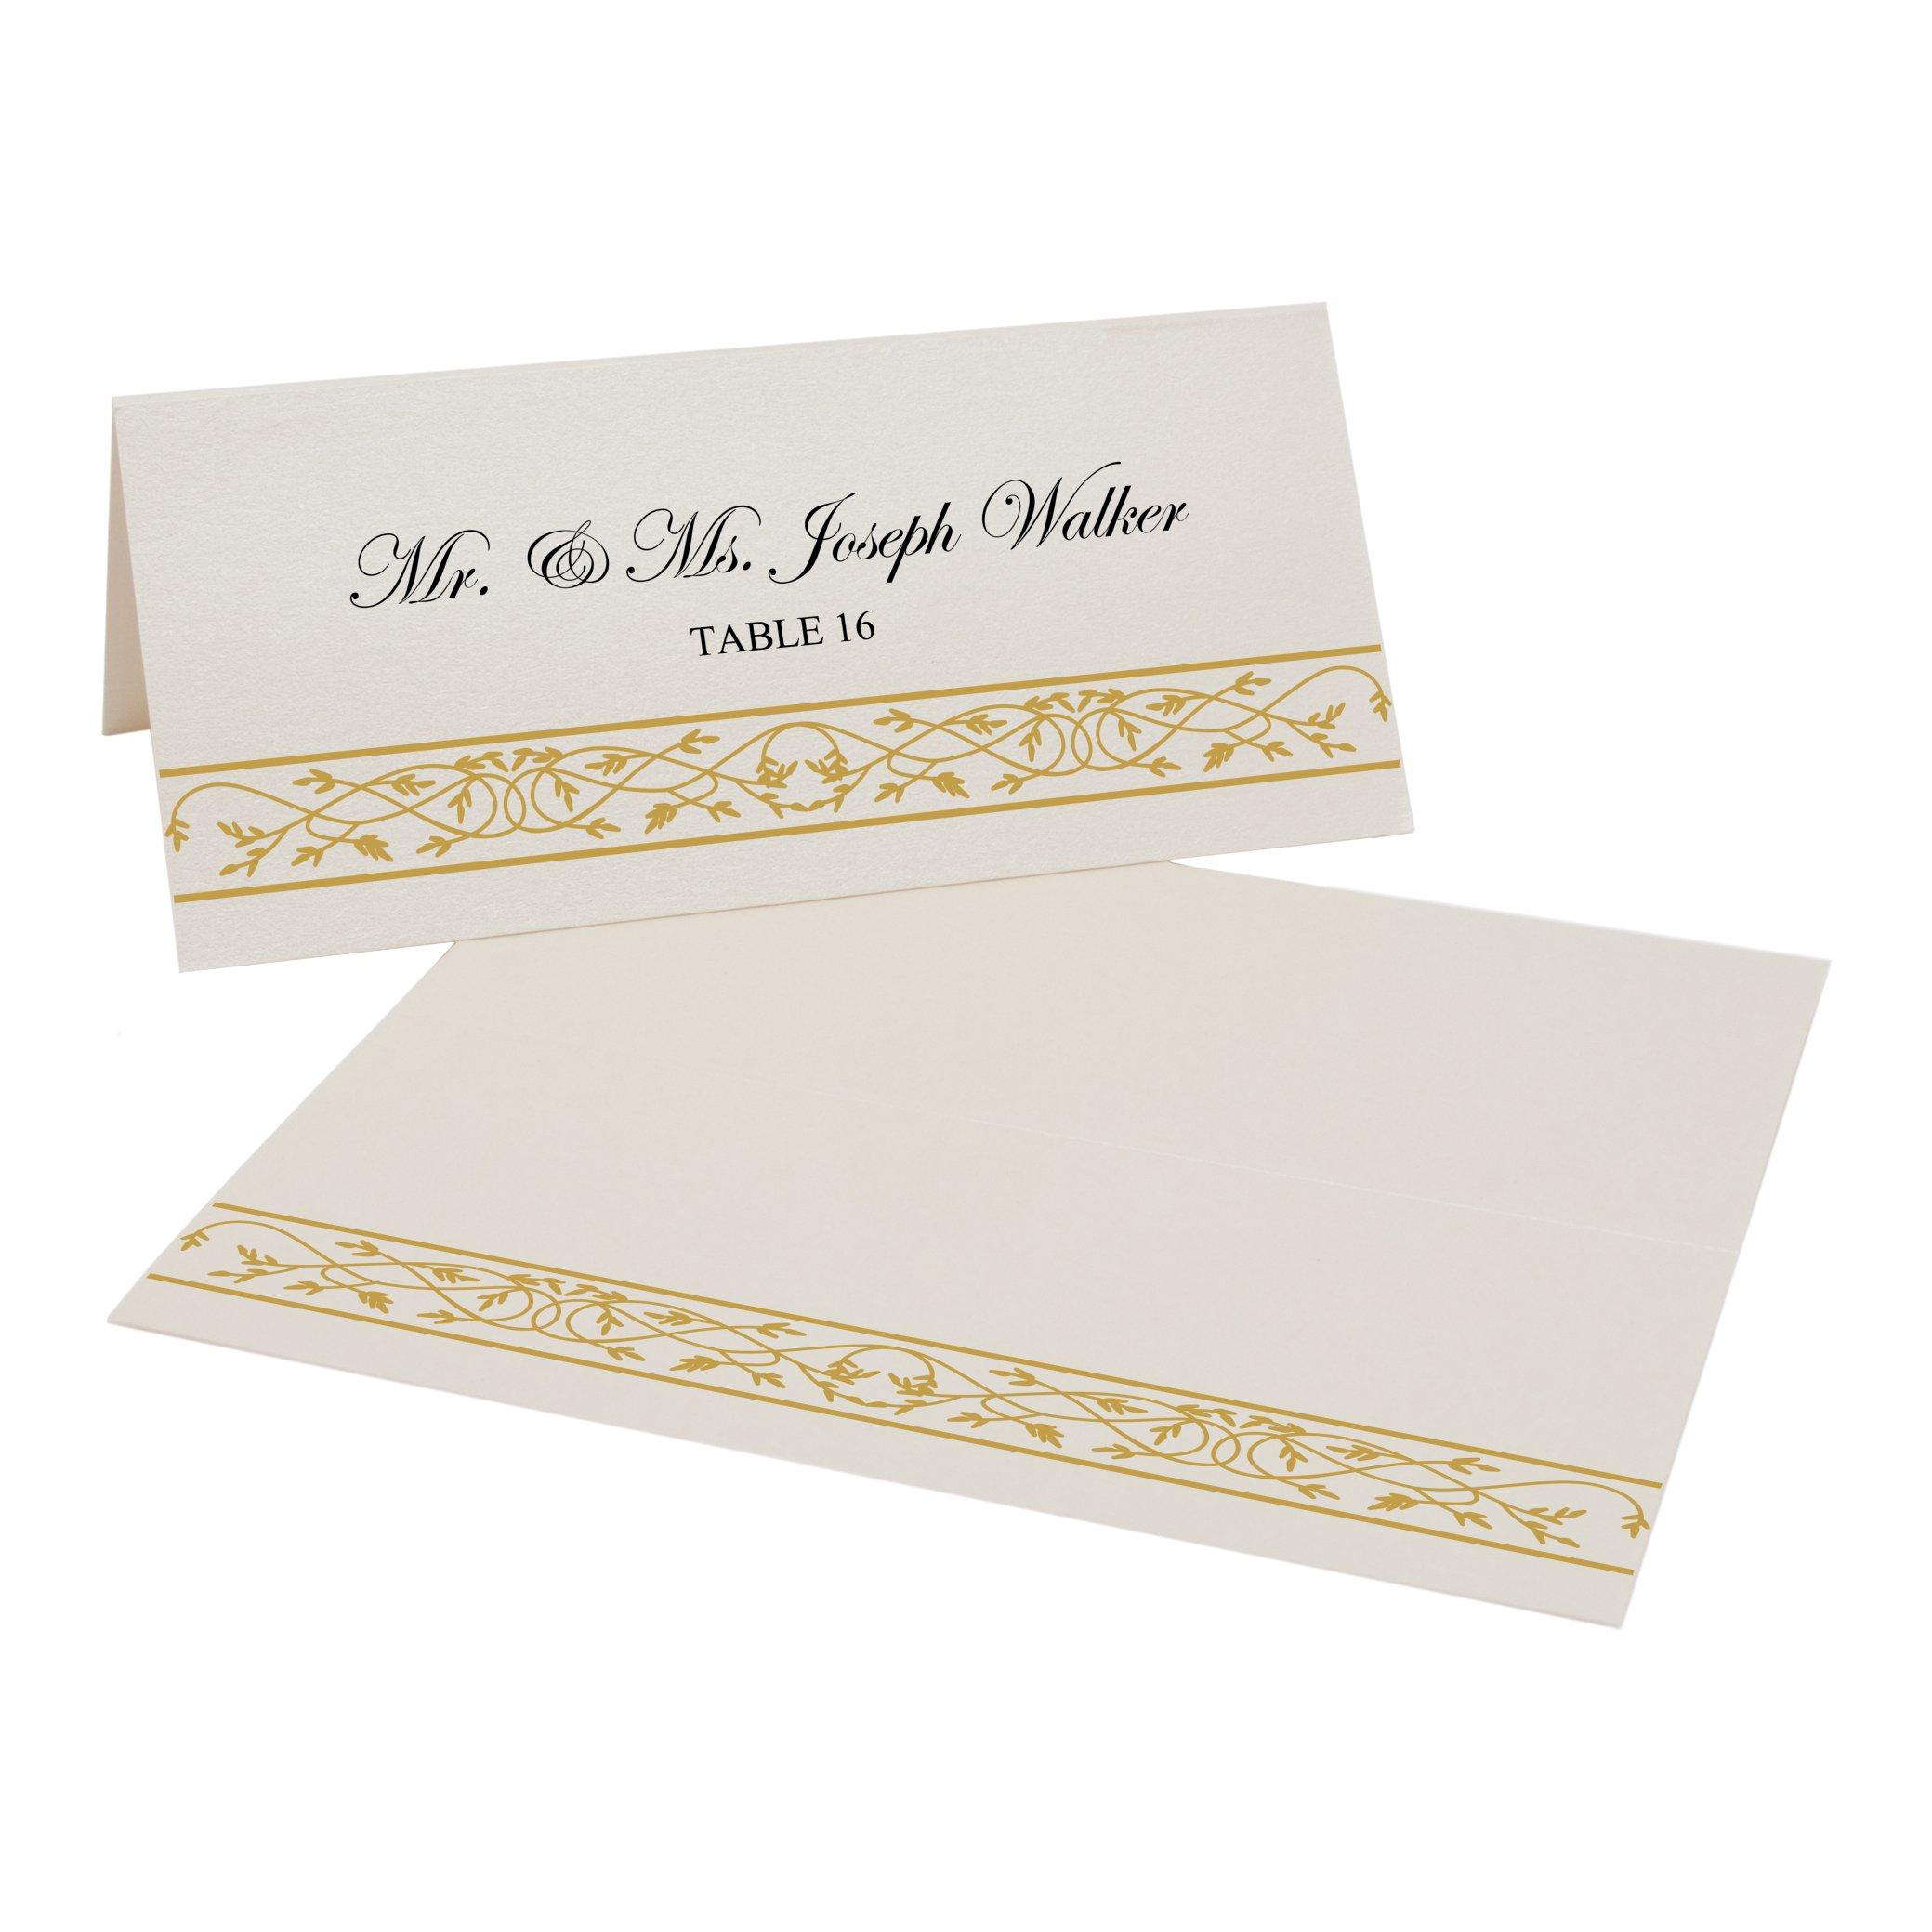 Celtic Leaf Border Easy Print Place Cards, Champagne, Gold, Set of 400 (100 Sheets)